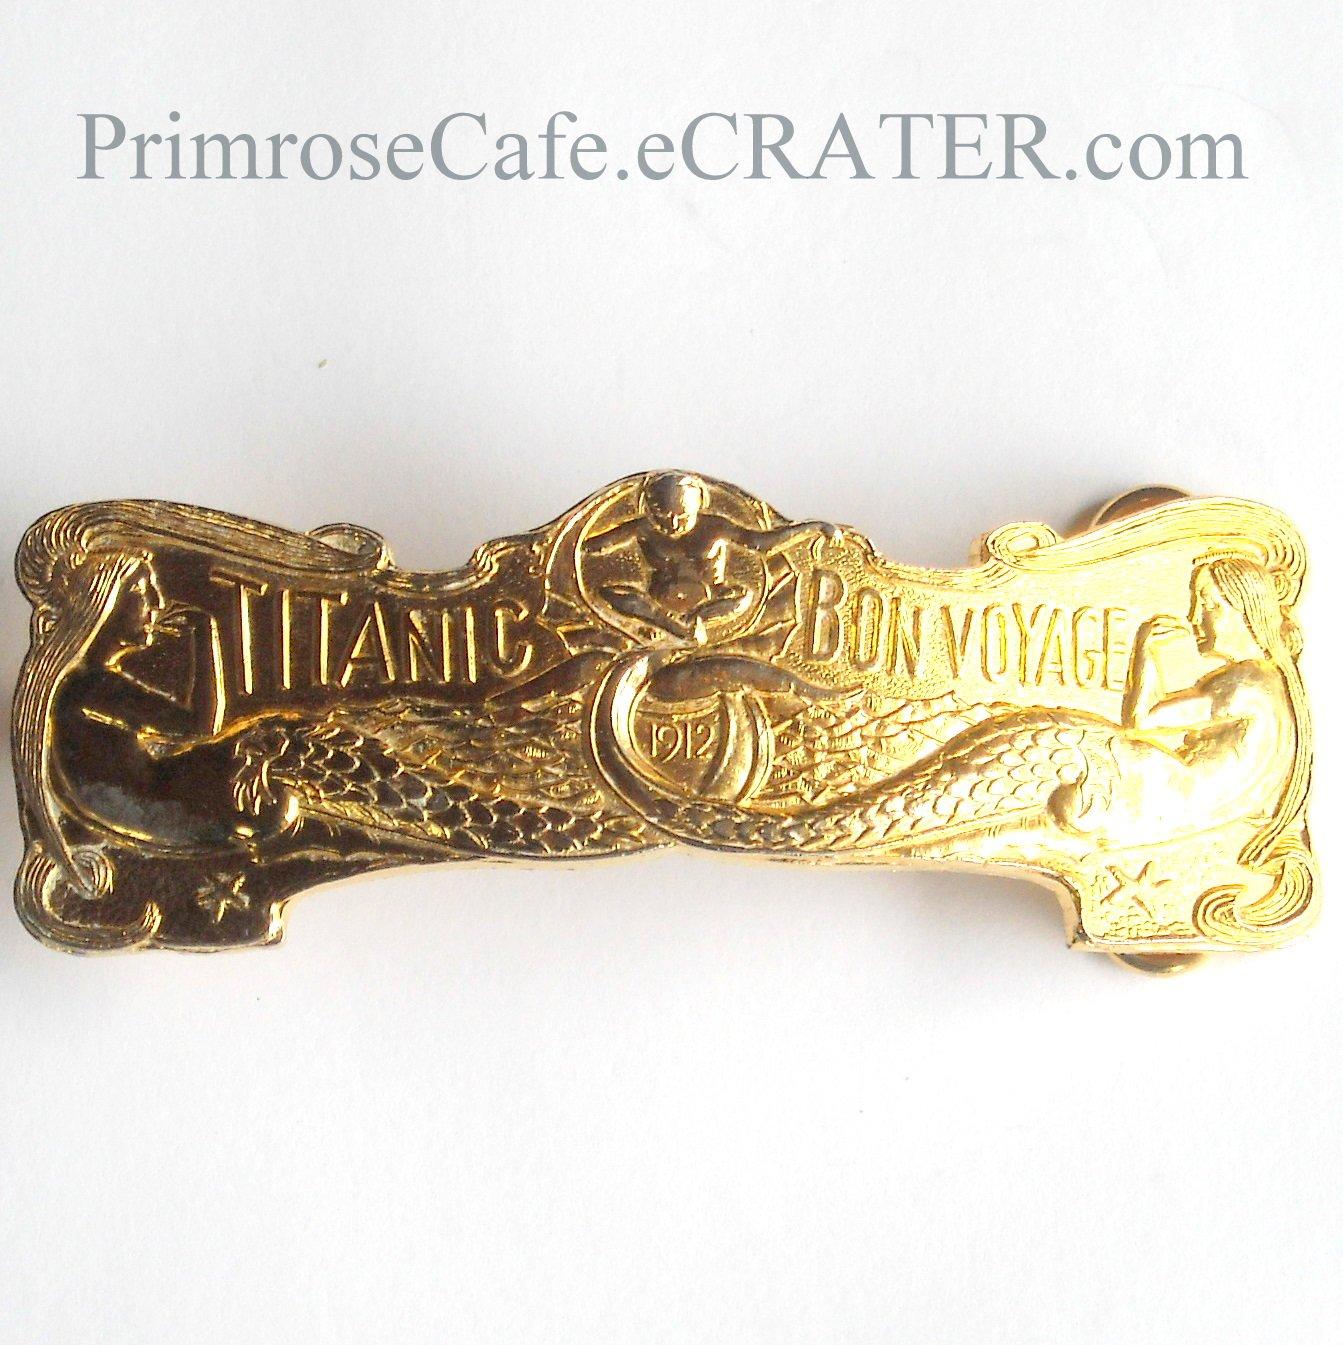 Vintage Titanic Bon Voyage 1912 Mermaids French Brass Belt Buckle